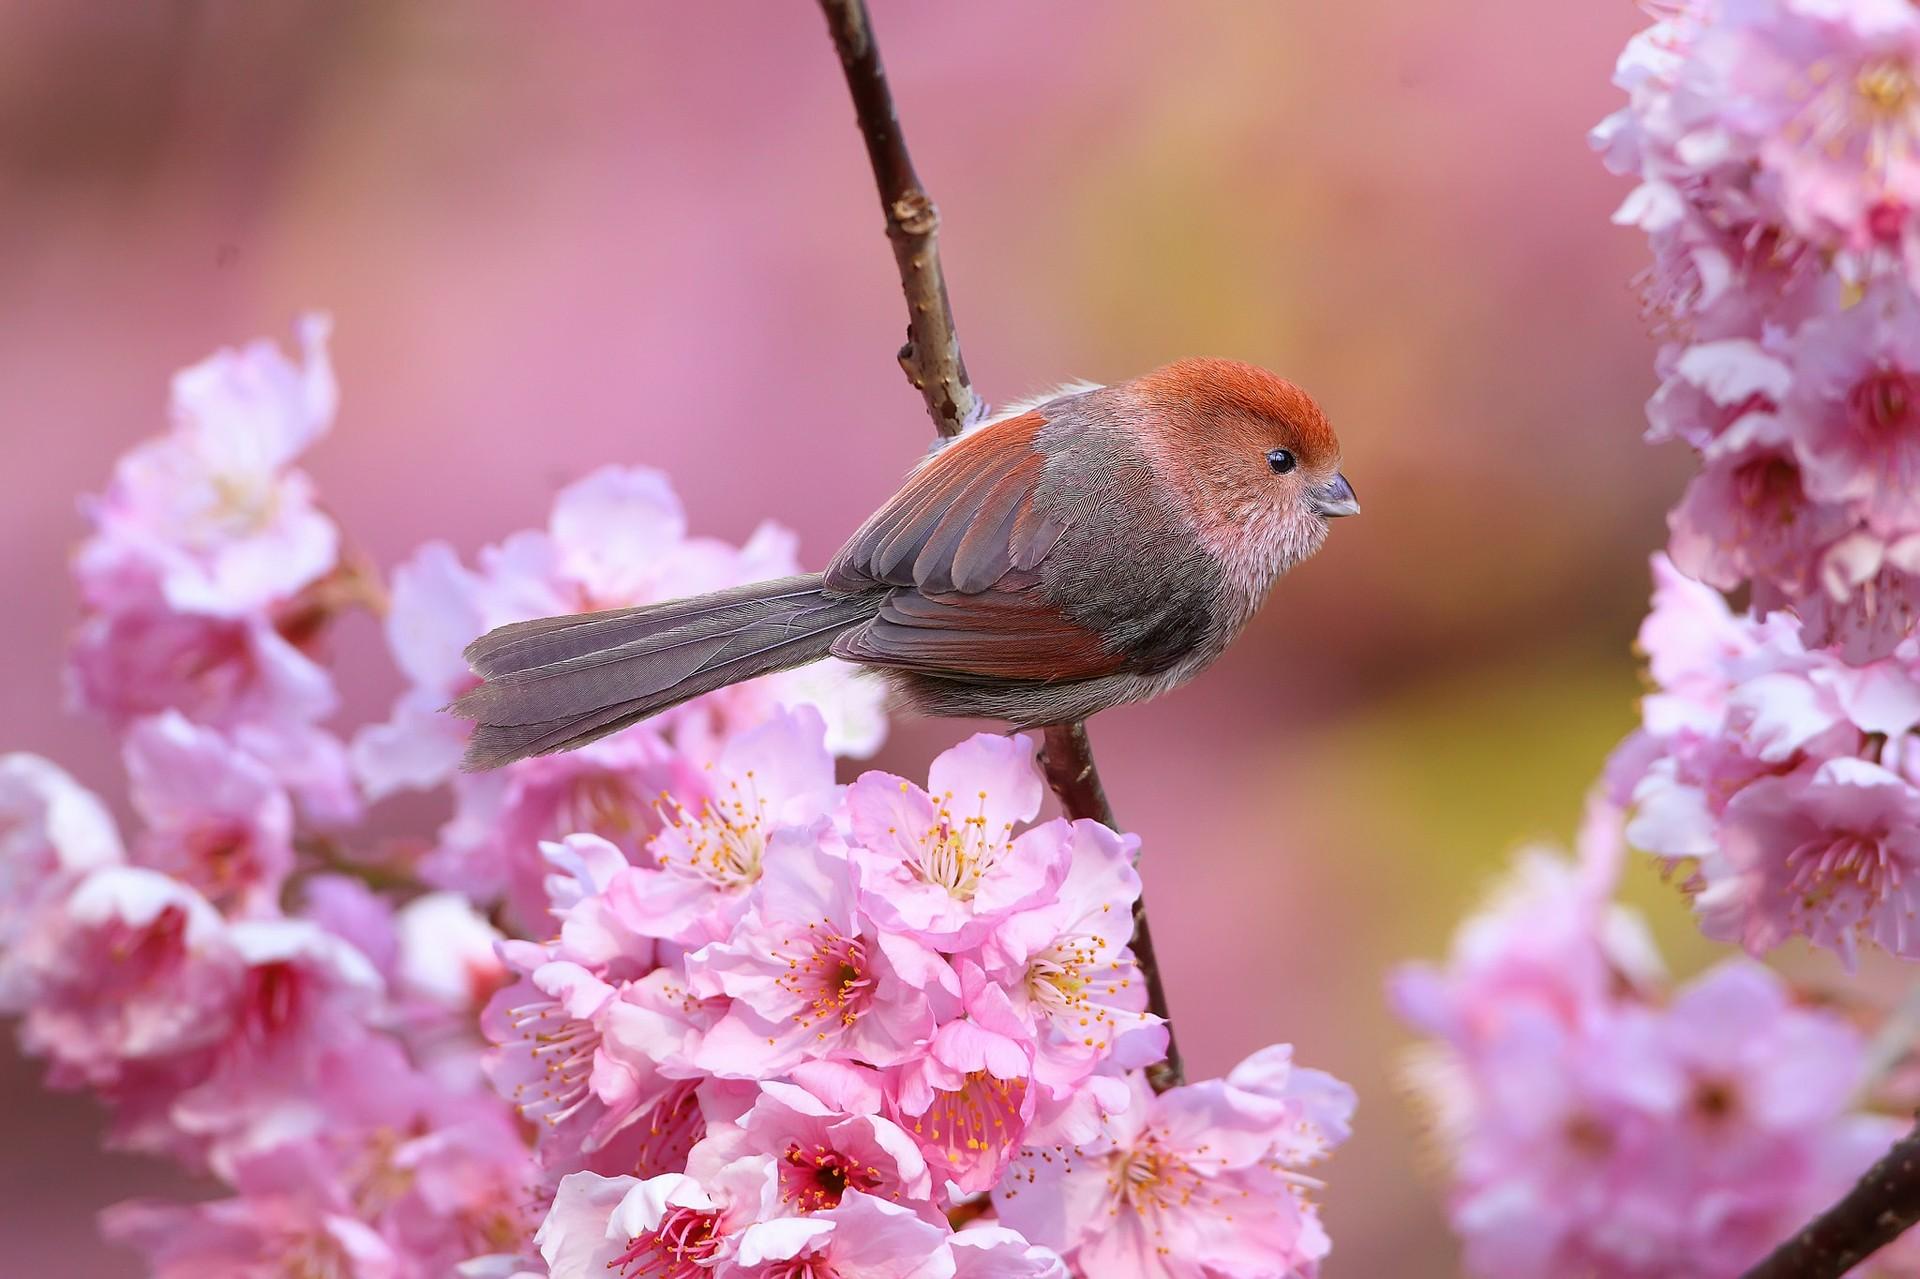 Wallpaper Birds Animals Pink Flowers Nature Branch Cherry